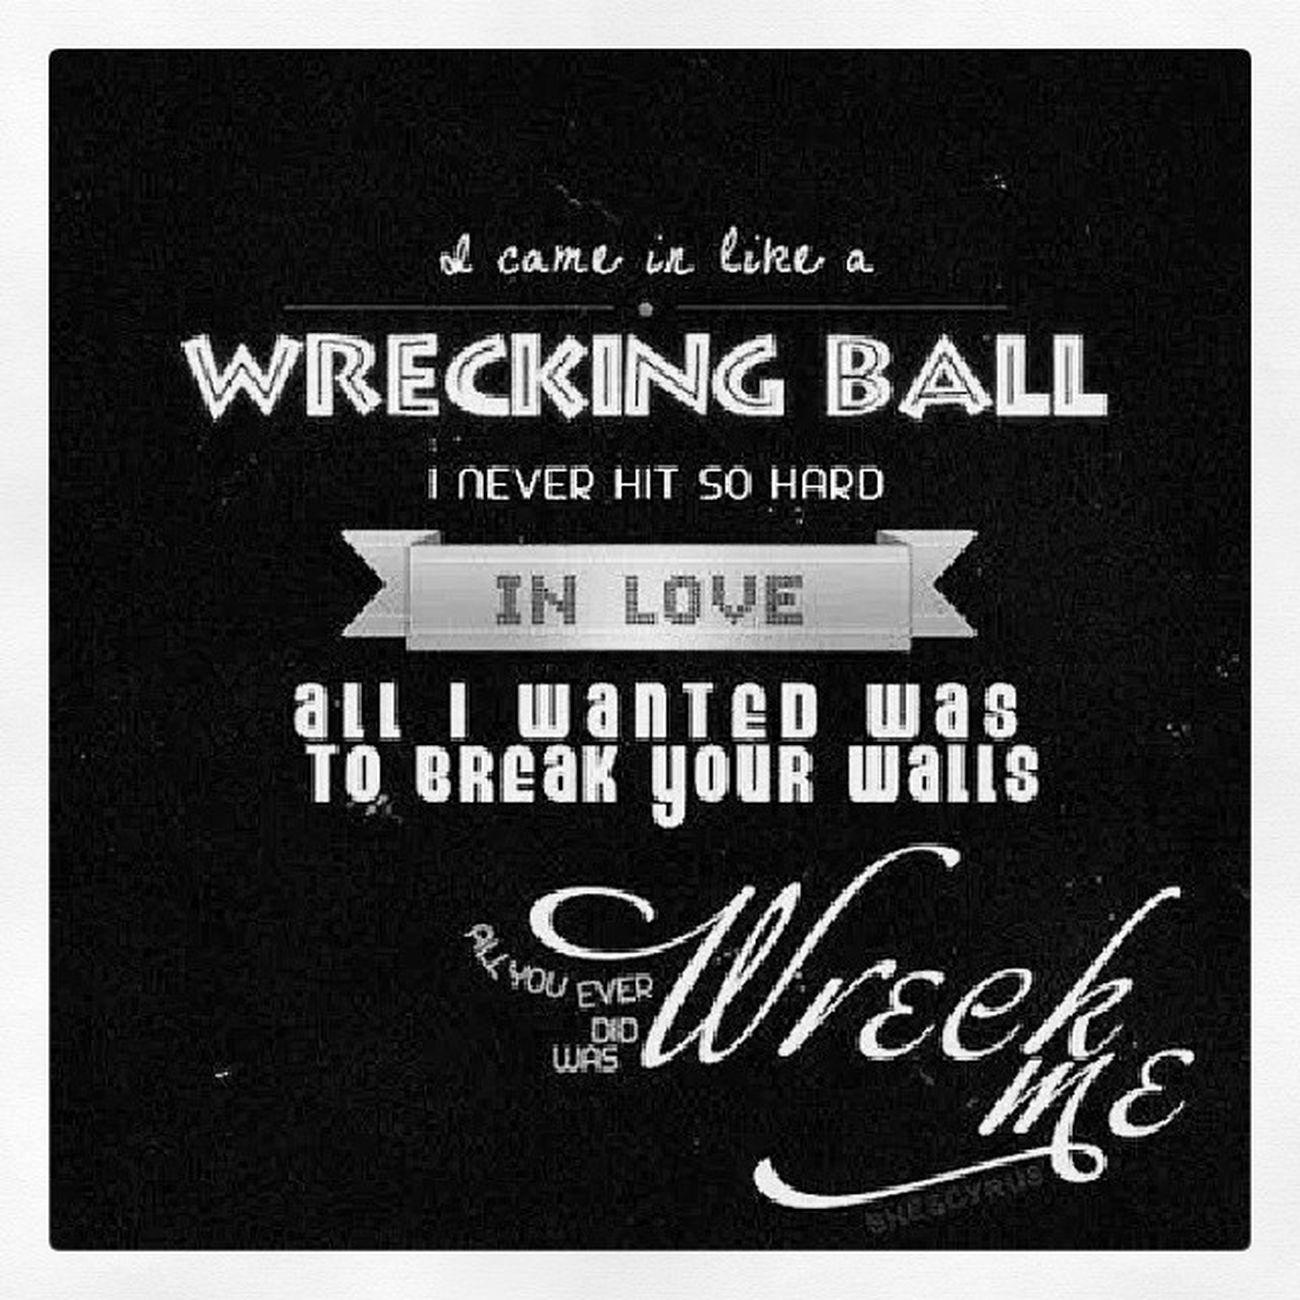 Wrecking Ball <3 Mileycyrus @mileycyrus